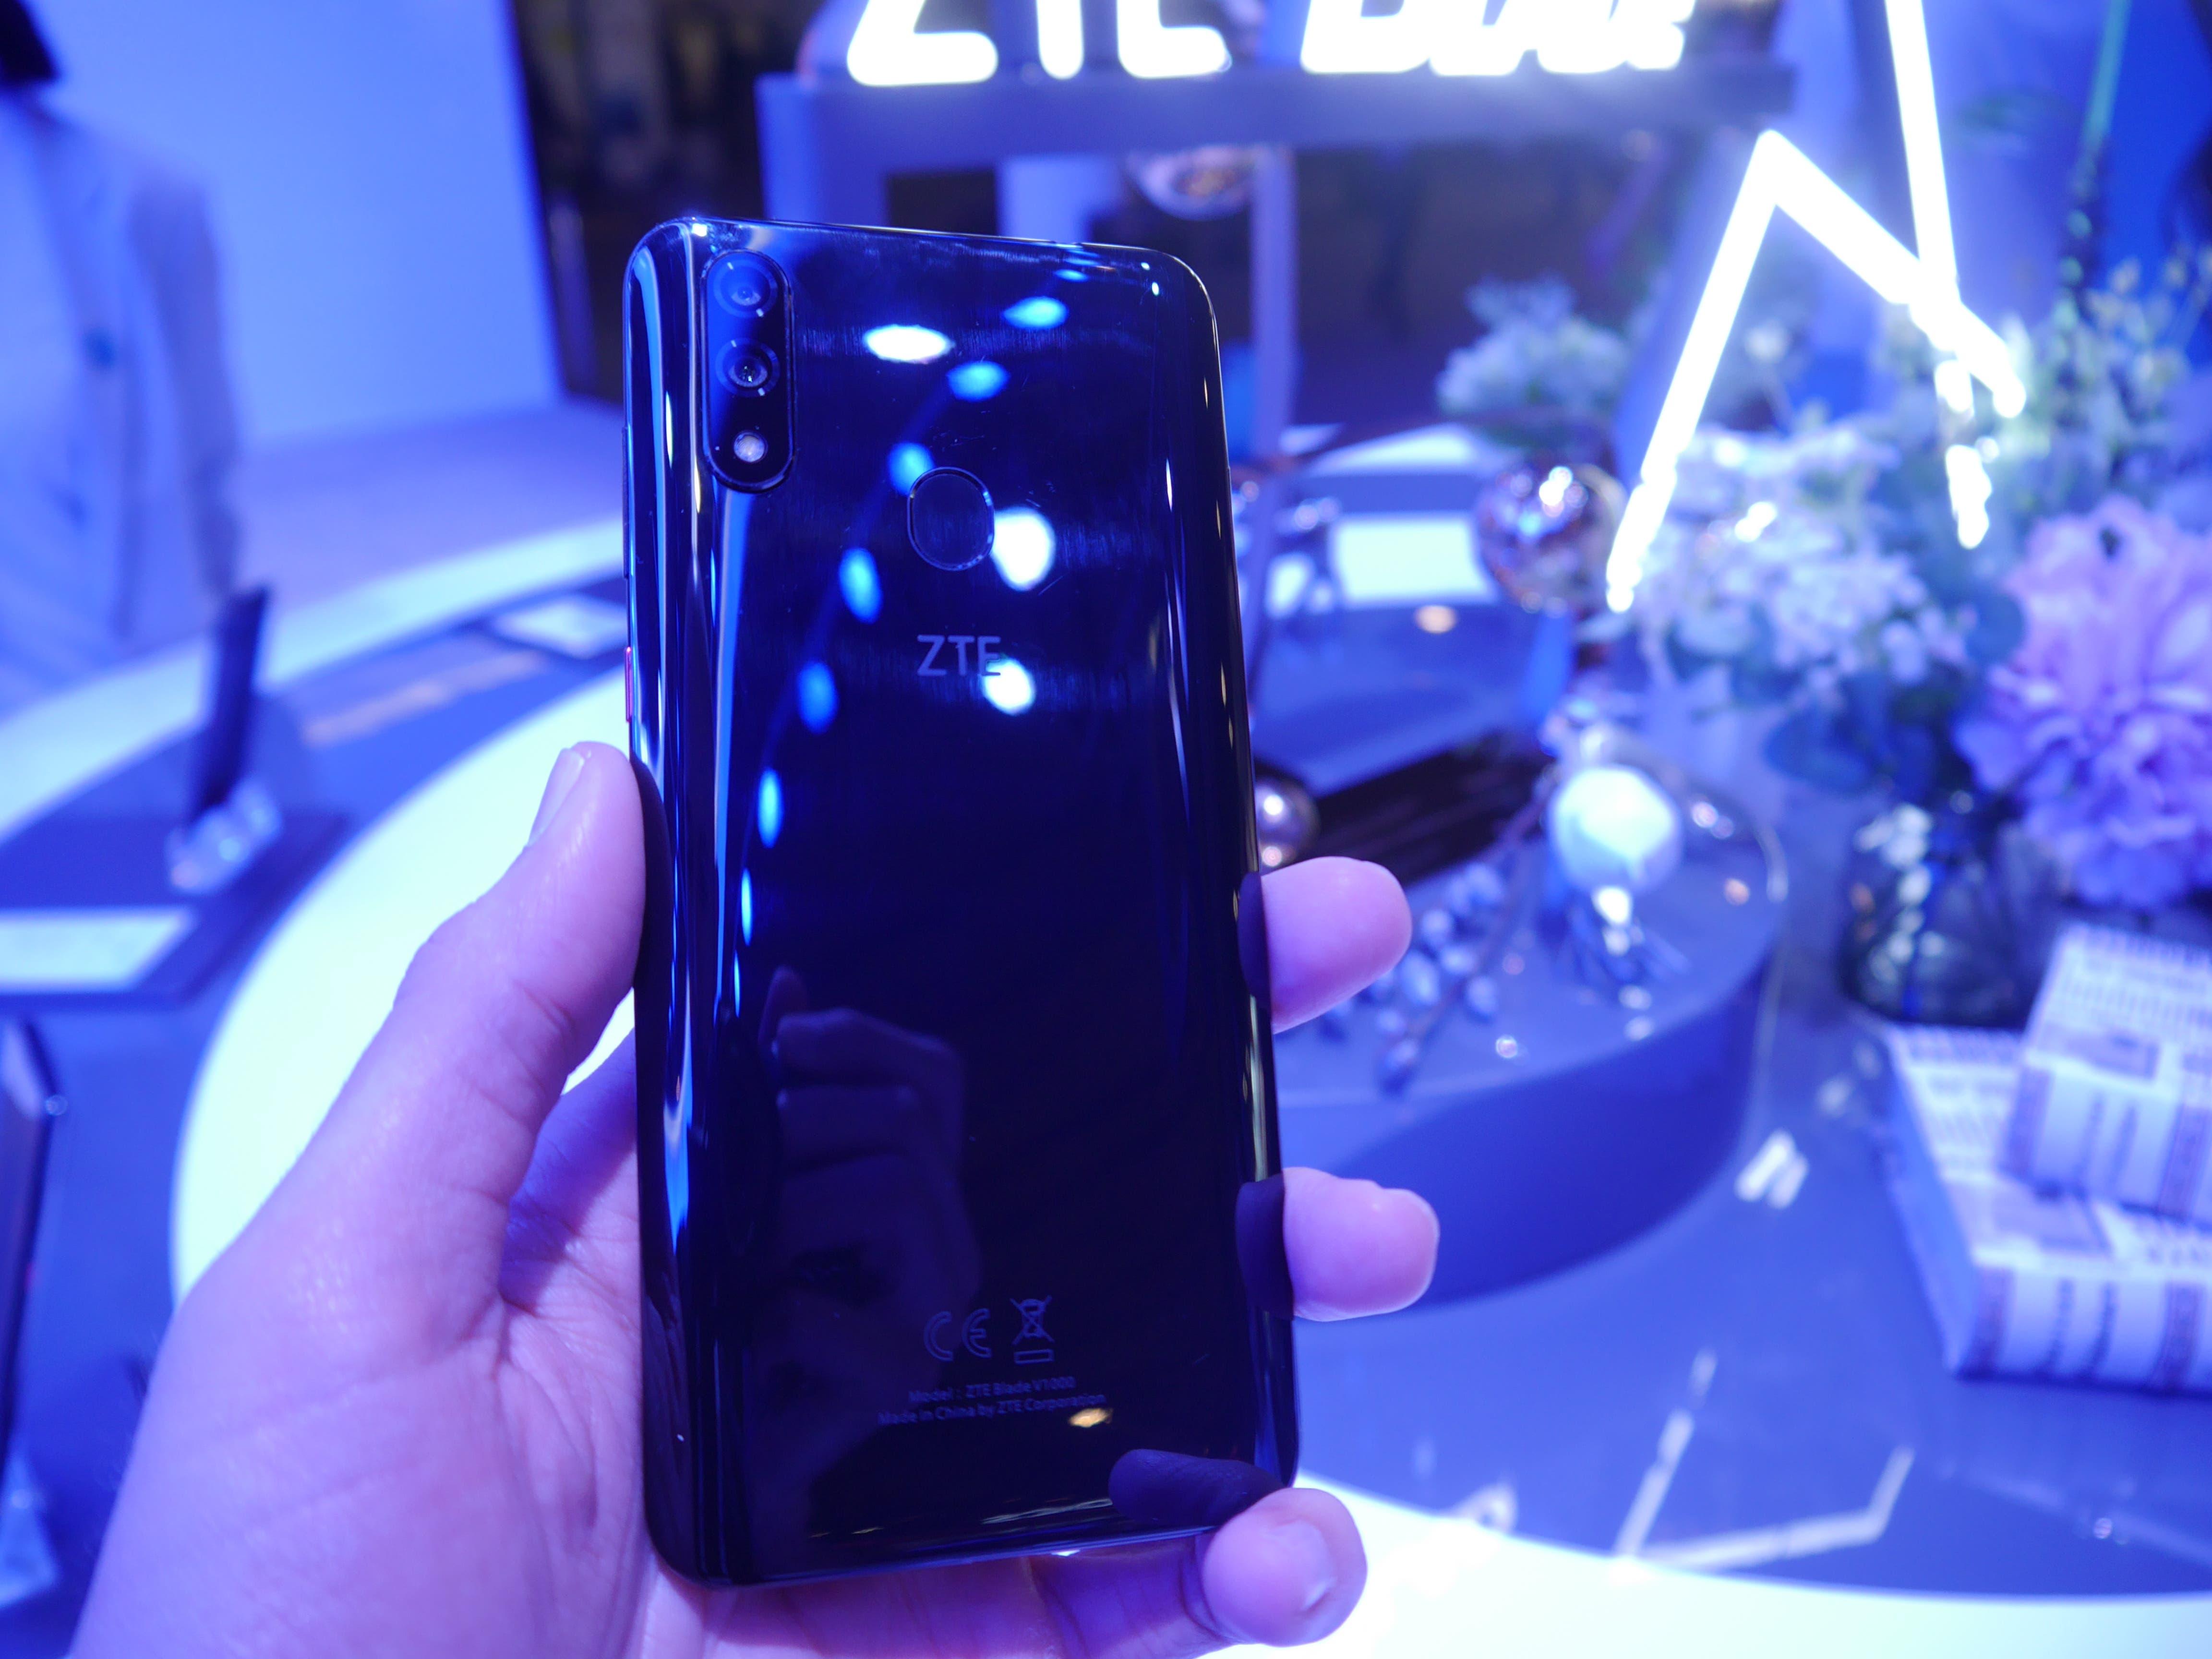 ZTE Blade V10 hands-on